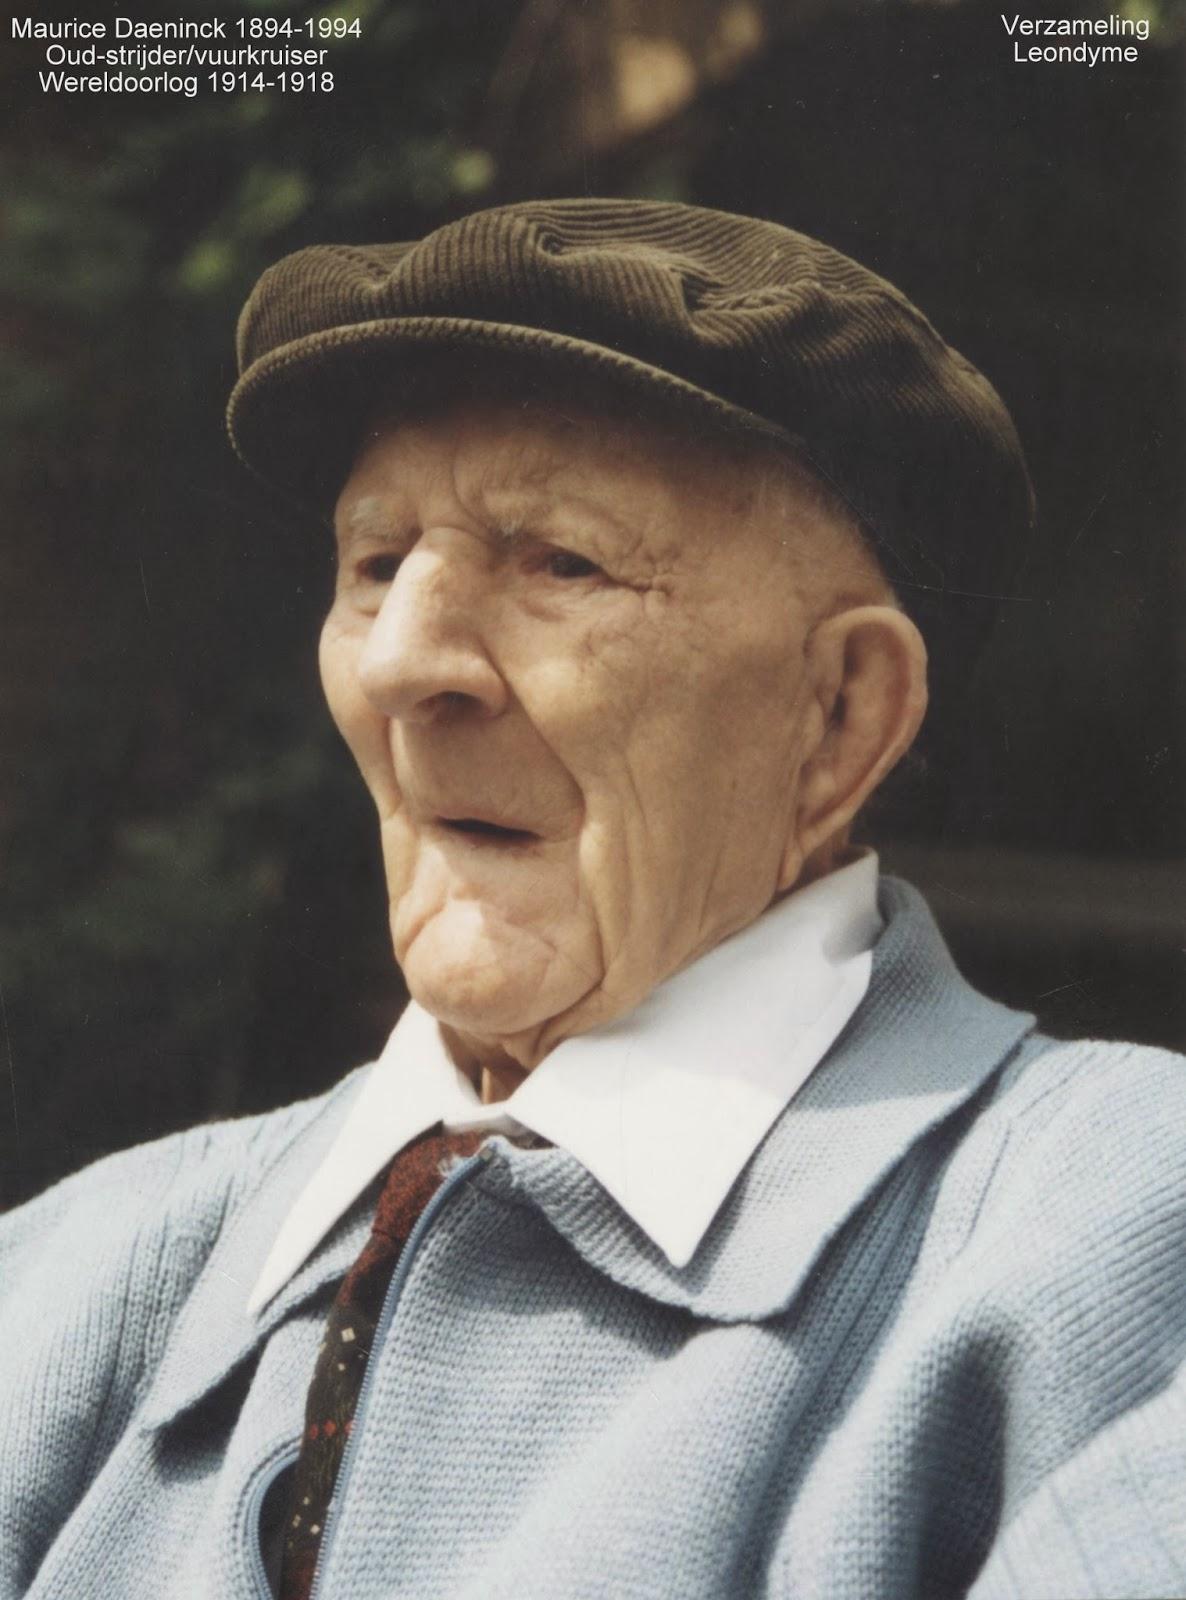 Oud-strijder en vuurkruiser Maurice Daeninck 1894-1994 op honderdjarige leeftijd. Verzameling Leondyme.